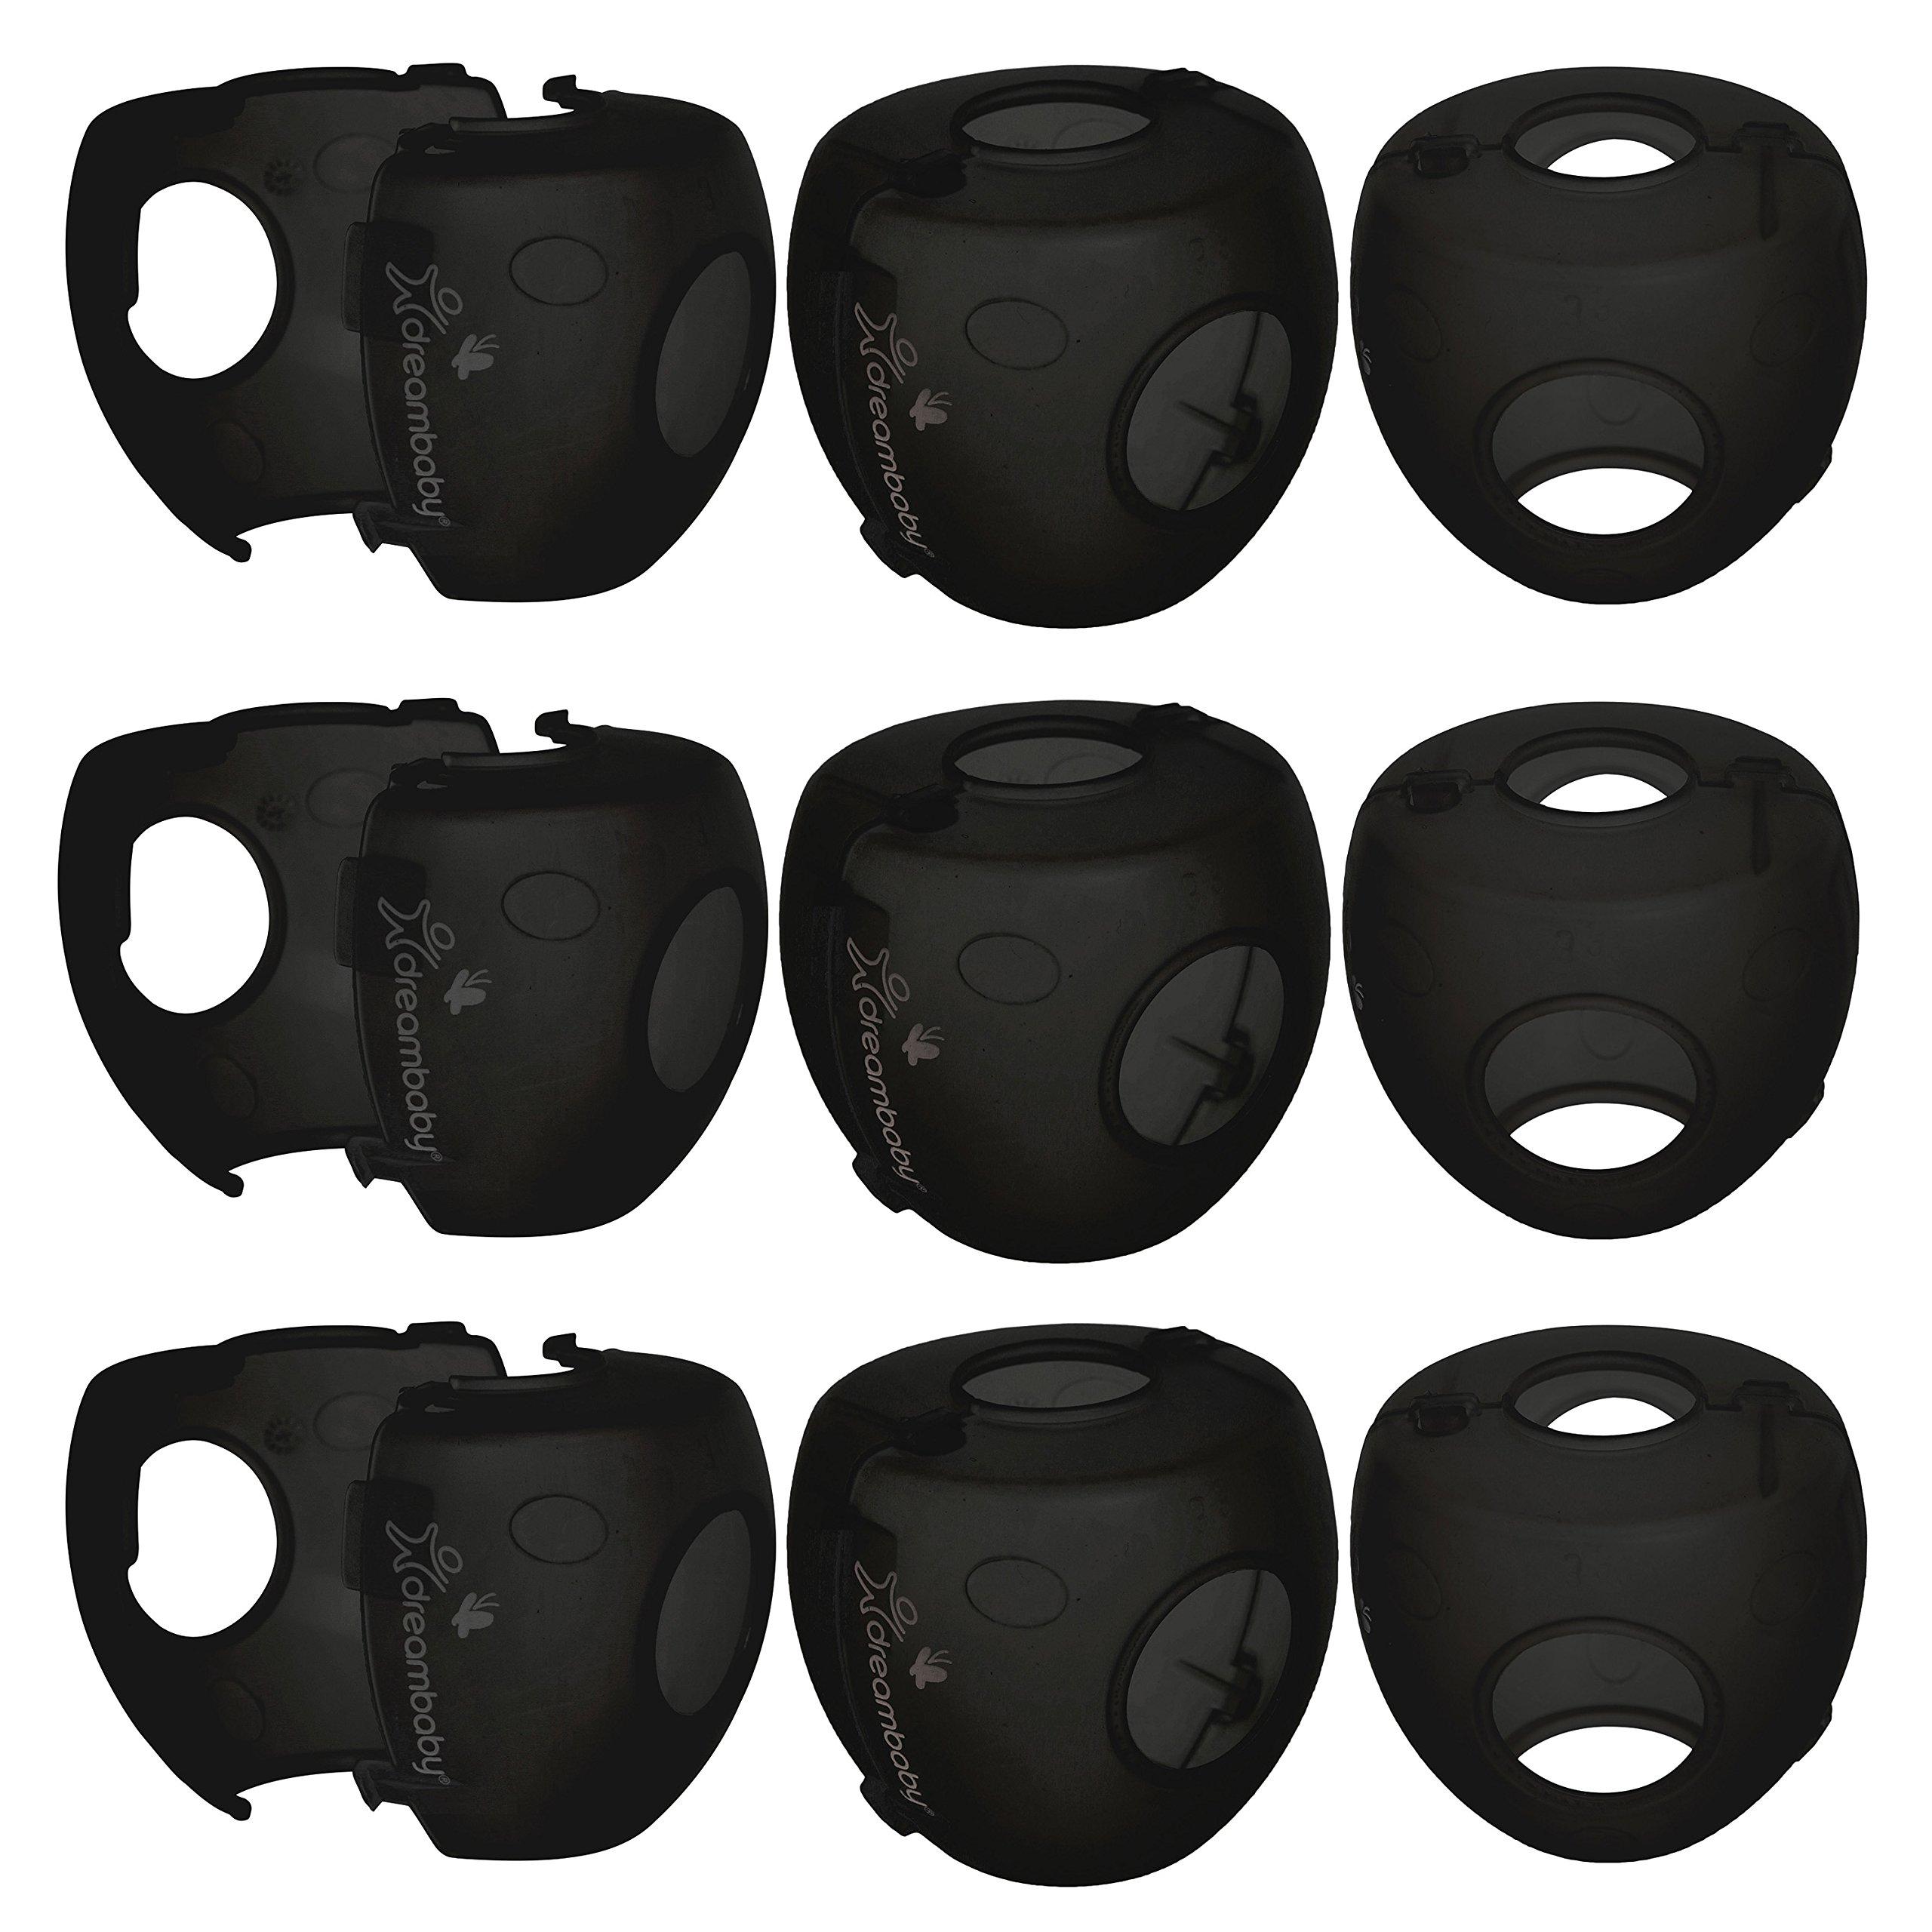 Dreambaby EZY-Fit Door Knob Covers (Smoke Black, 9 Pack)